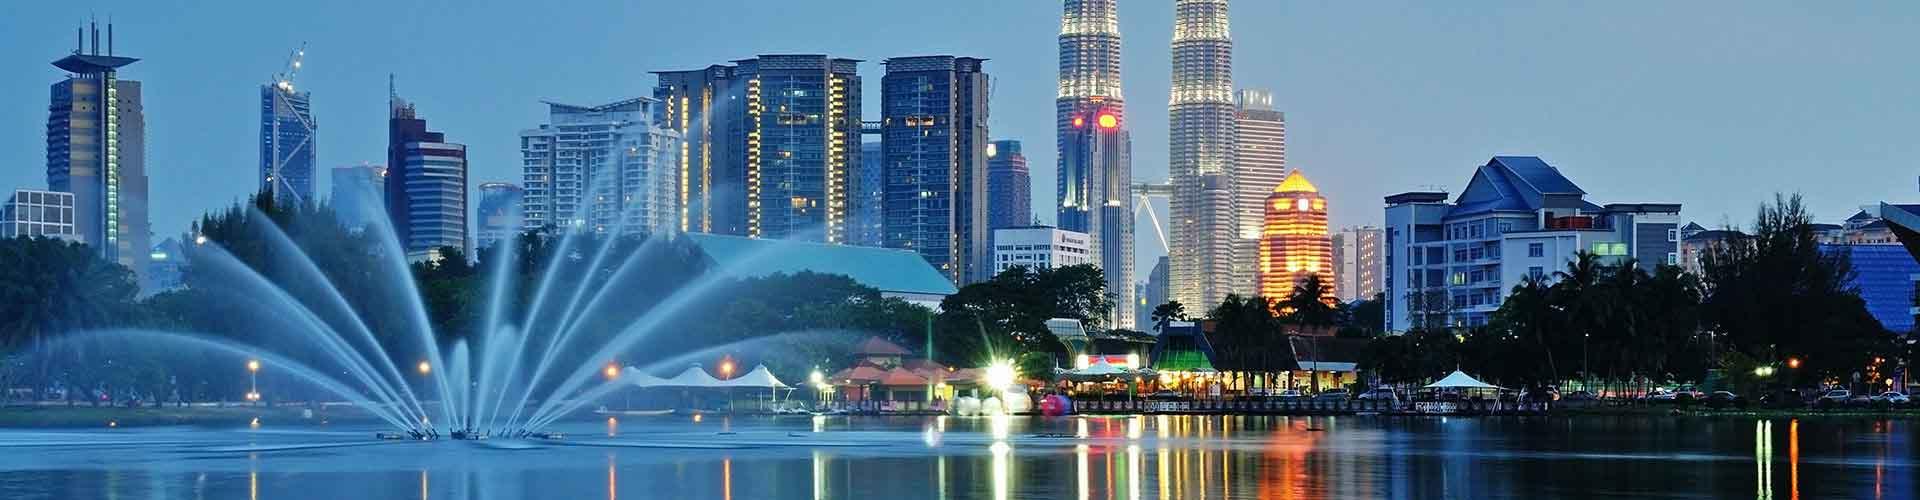 Kuala Lumpur - Hostales en el distrito Bandar Tasek Selatan. Mapas de Kuala Lumpur, Fotos y comentarios de cada Hostal en Kuala Lumpur.